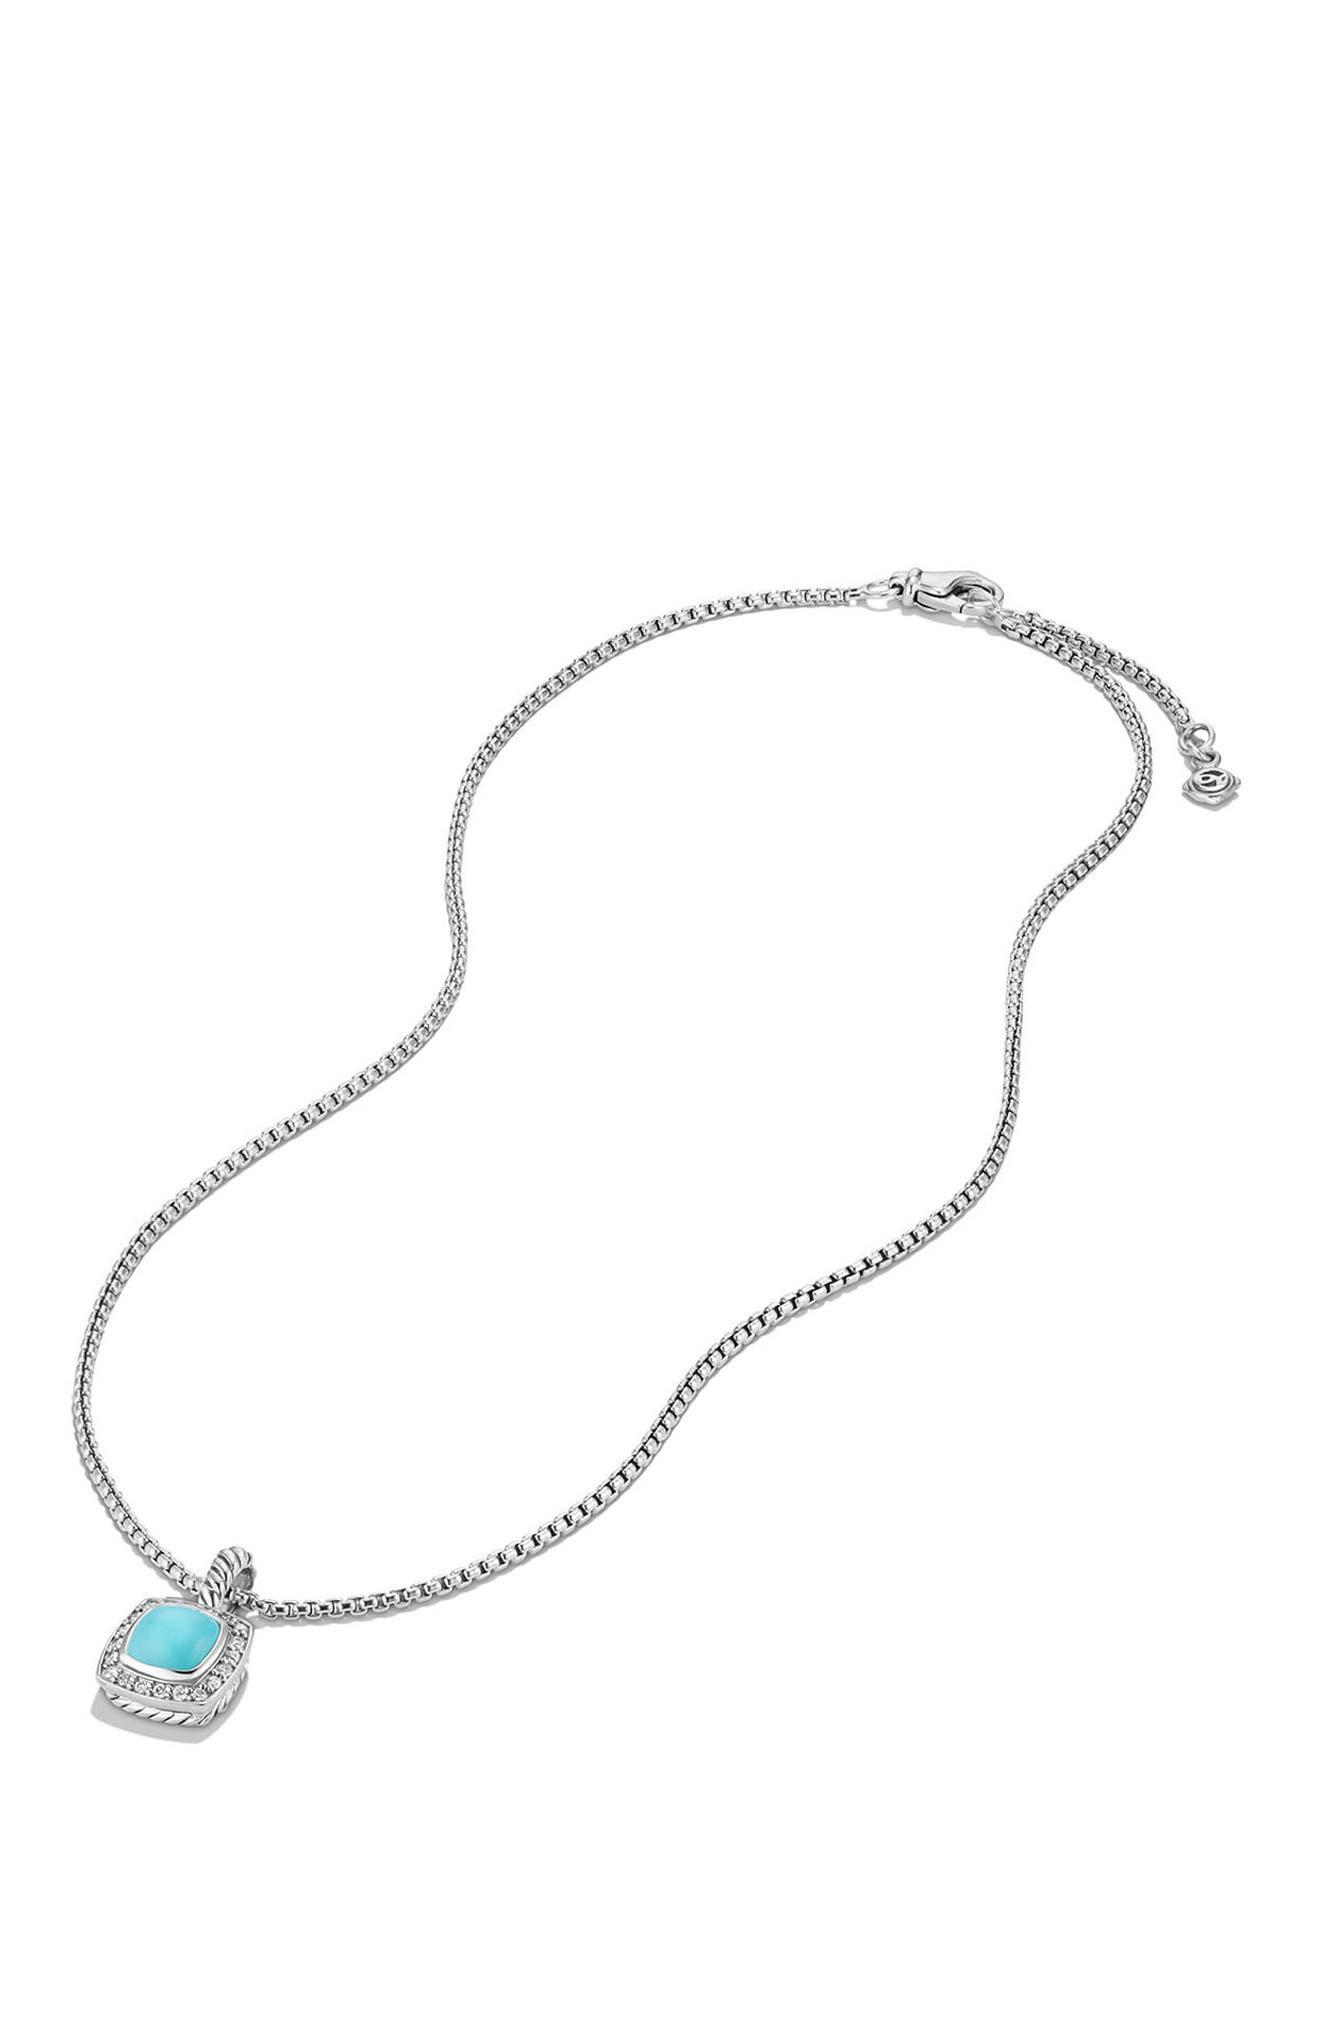 Alternate Image 3  - David Yurman Petite Albion® Pendant Necklace with Diamonds